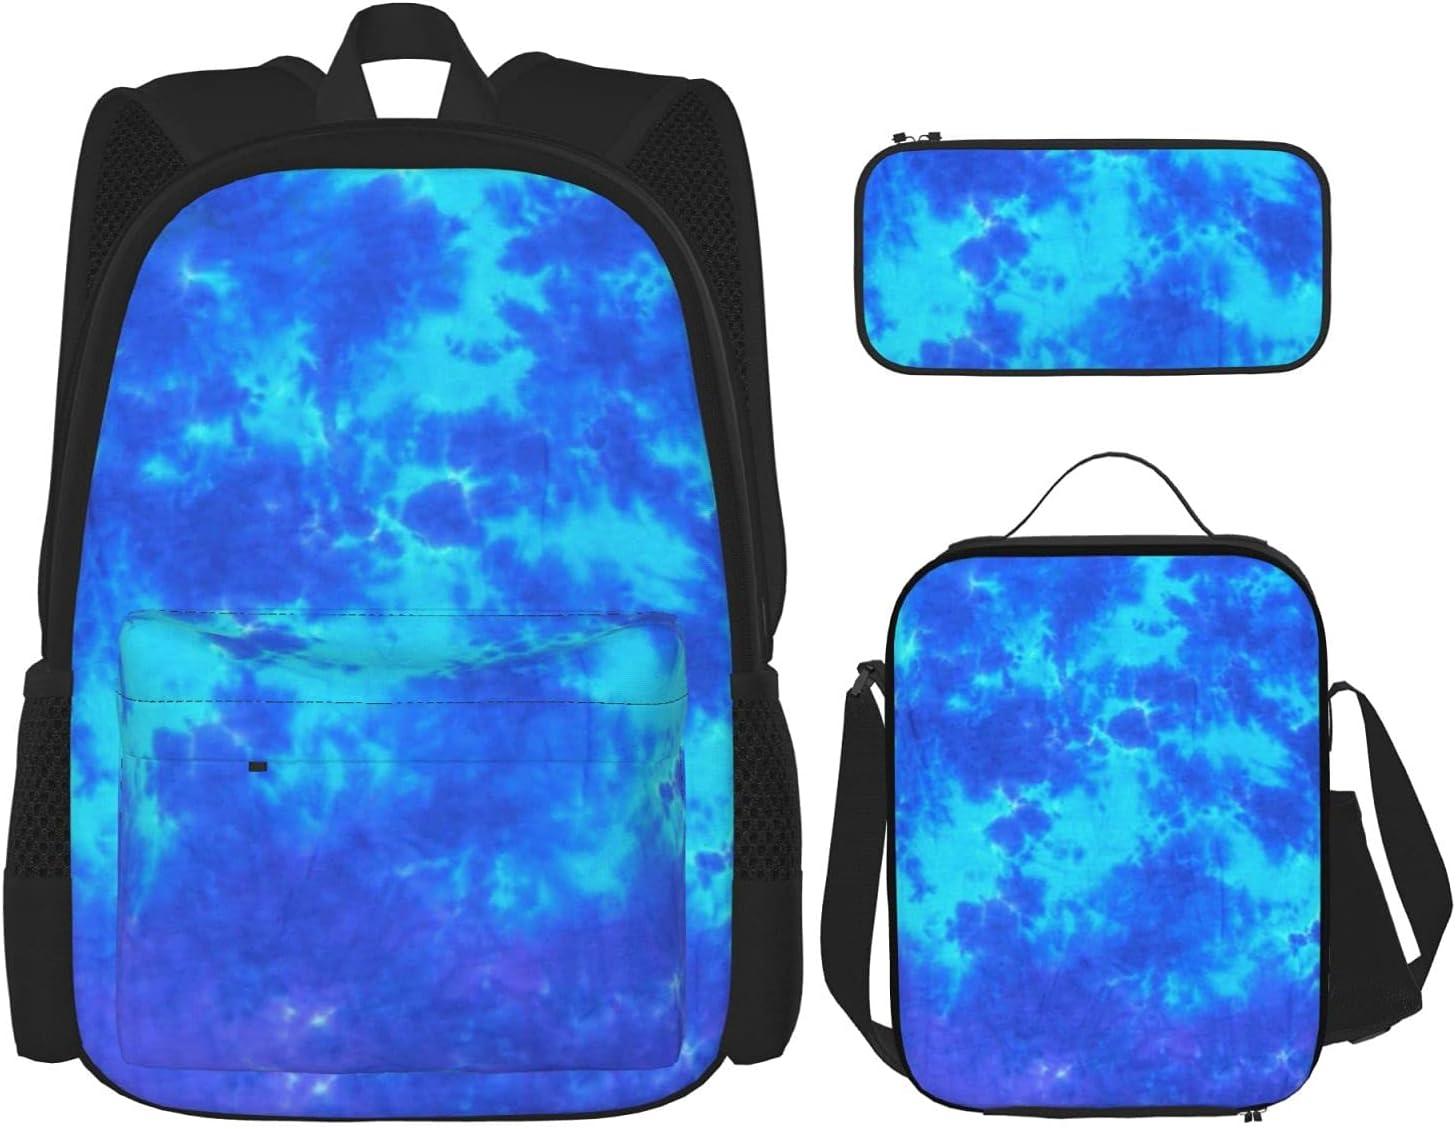 Inexpensive Blue Tie Dye Backpack Boys Children School Book 3-In-1 Credence Bag S